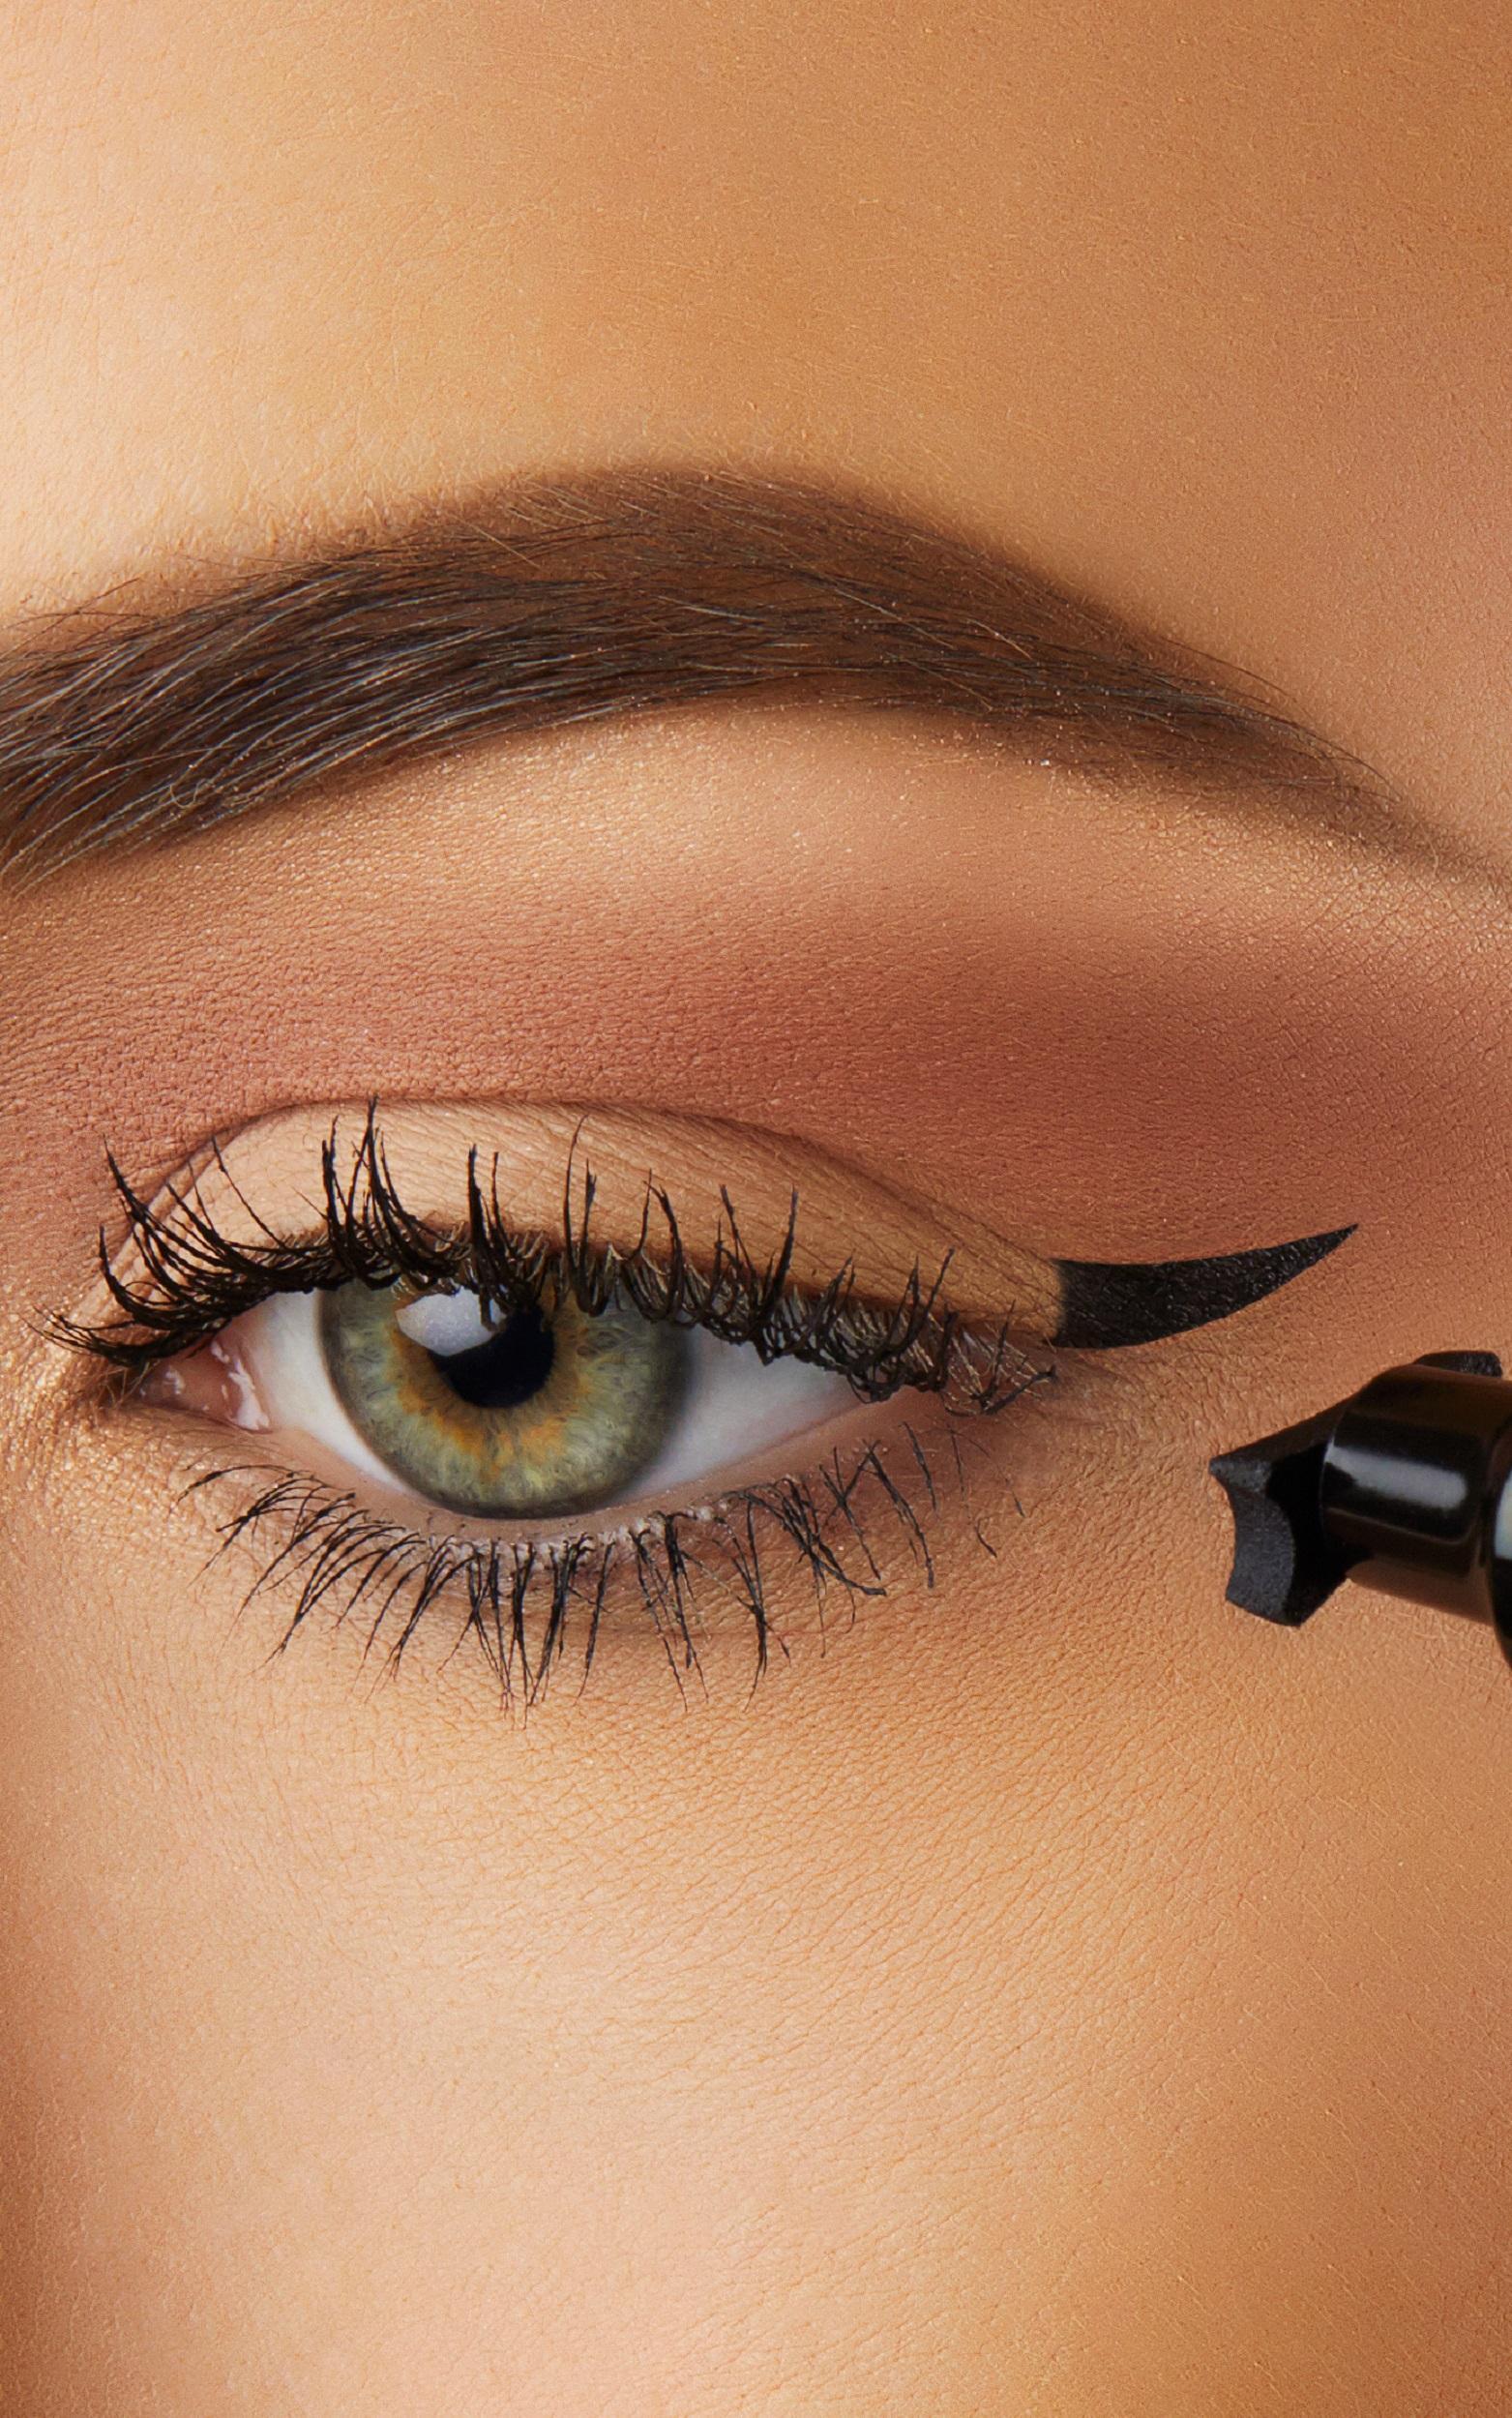 The Quick Flick - Petite 8mm Wing Eyeliner in Black, Black, hi-res image number null